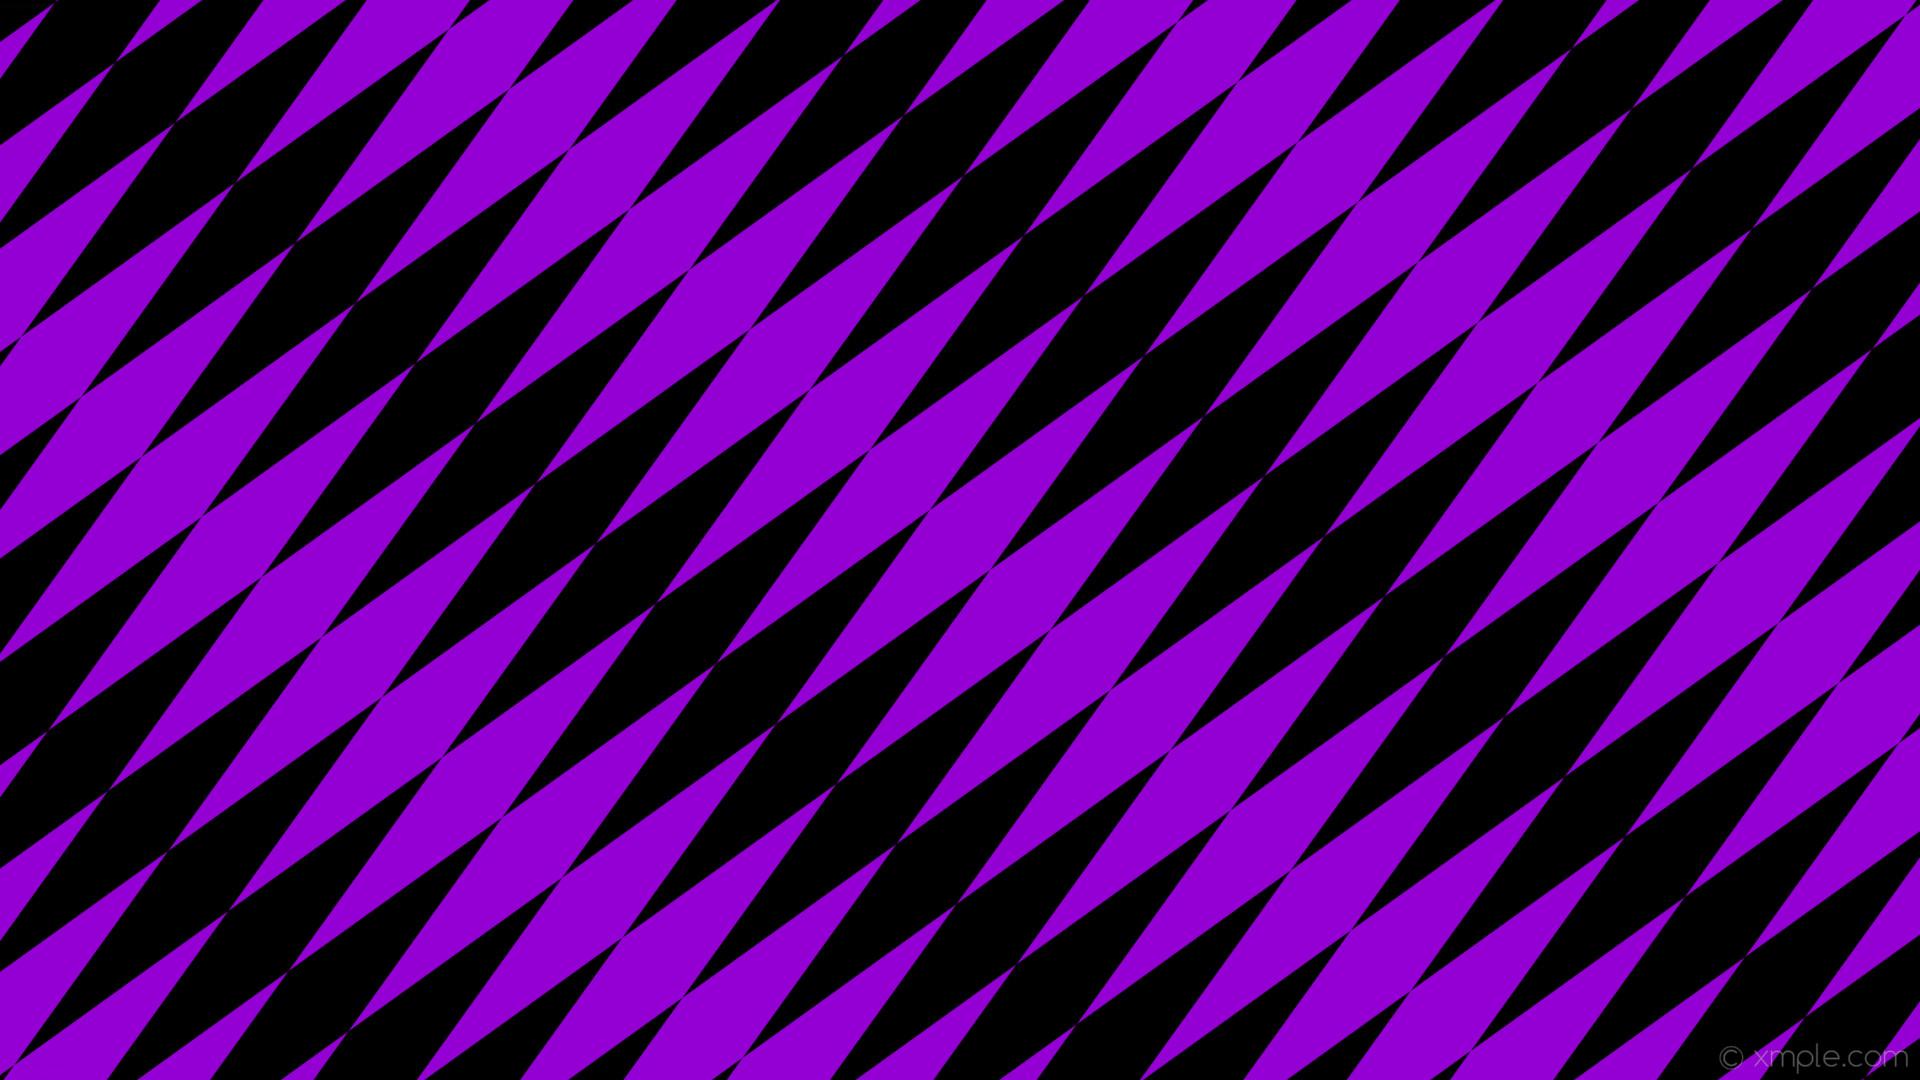 wallpaper rhombus black purple diamond lozenge dark violet #9400d3 #000000  45° 520px 85px